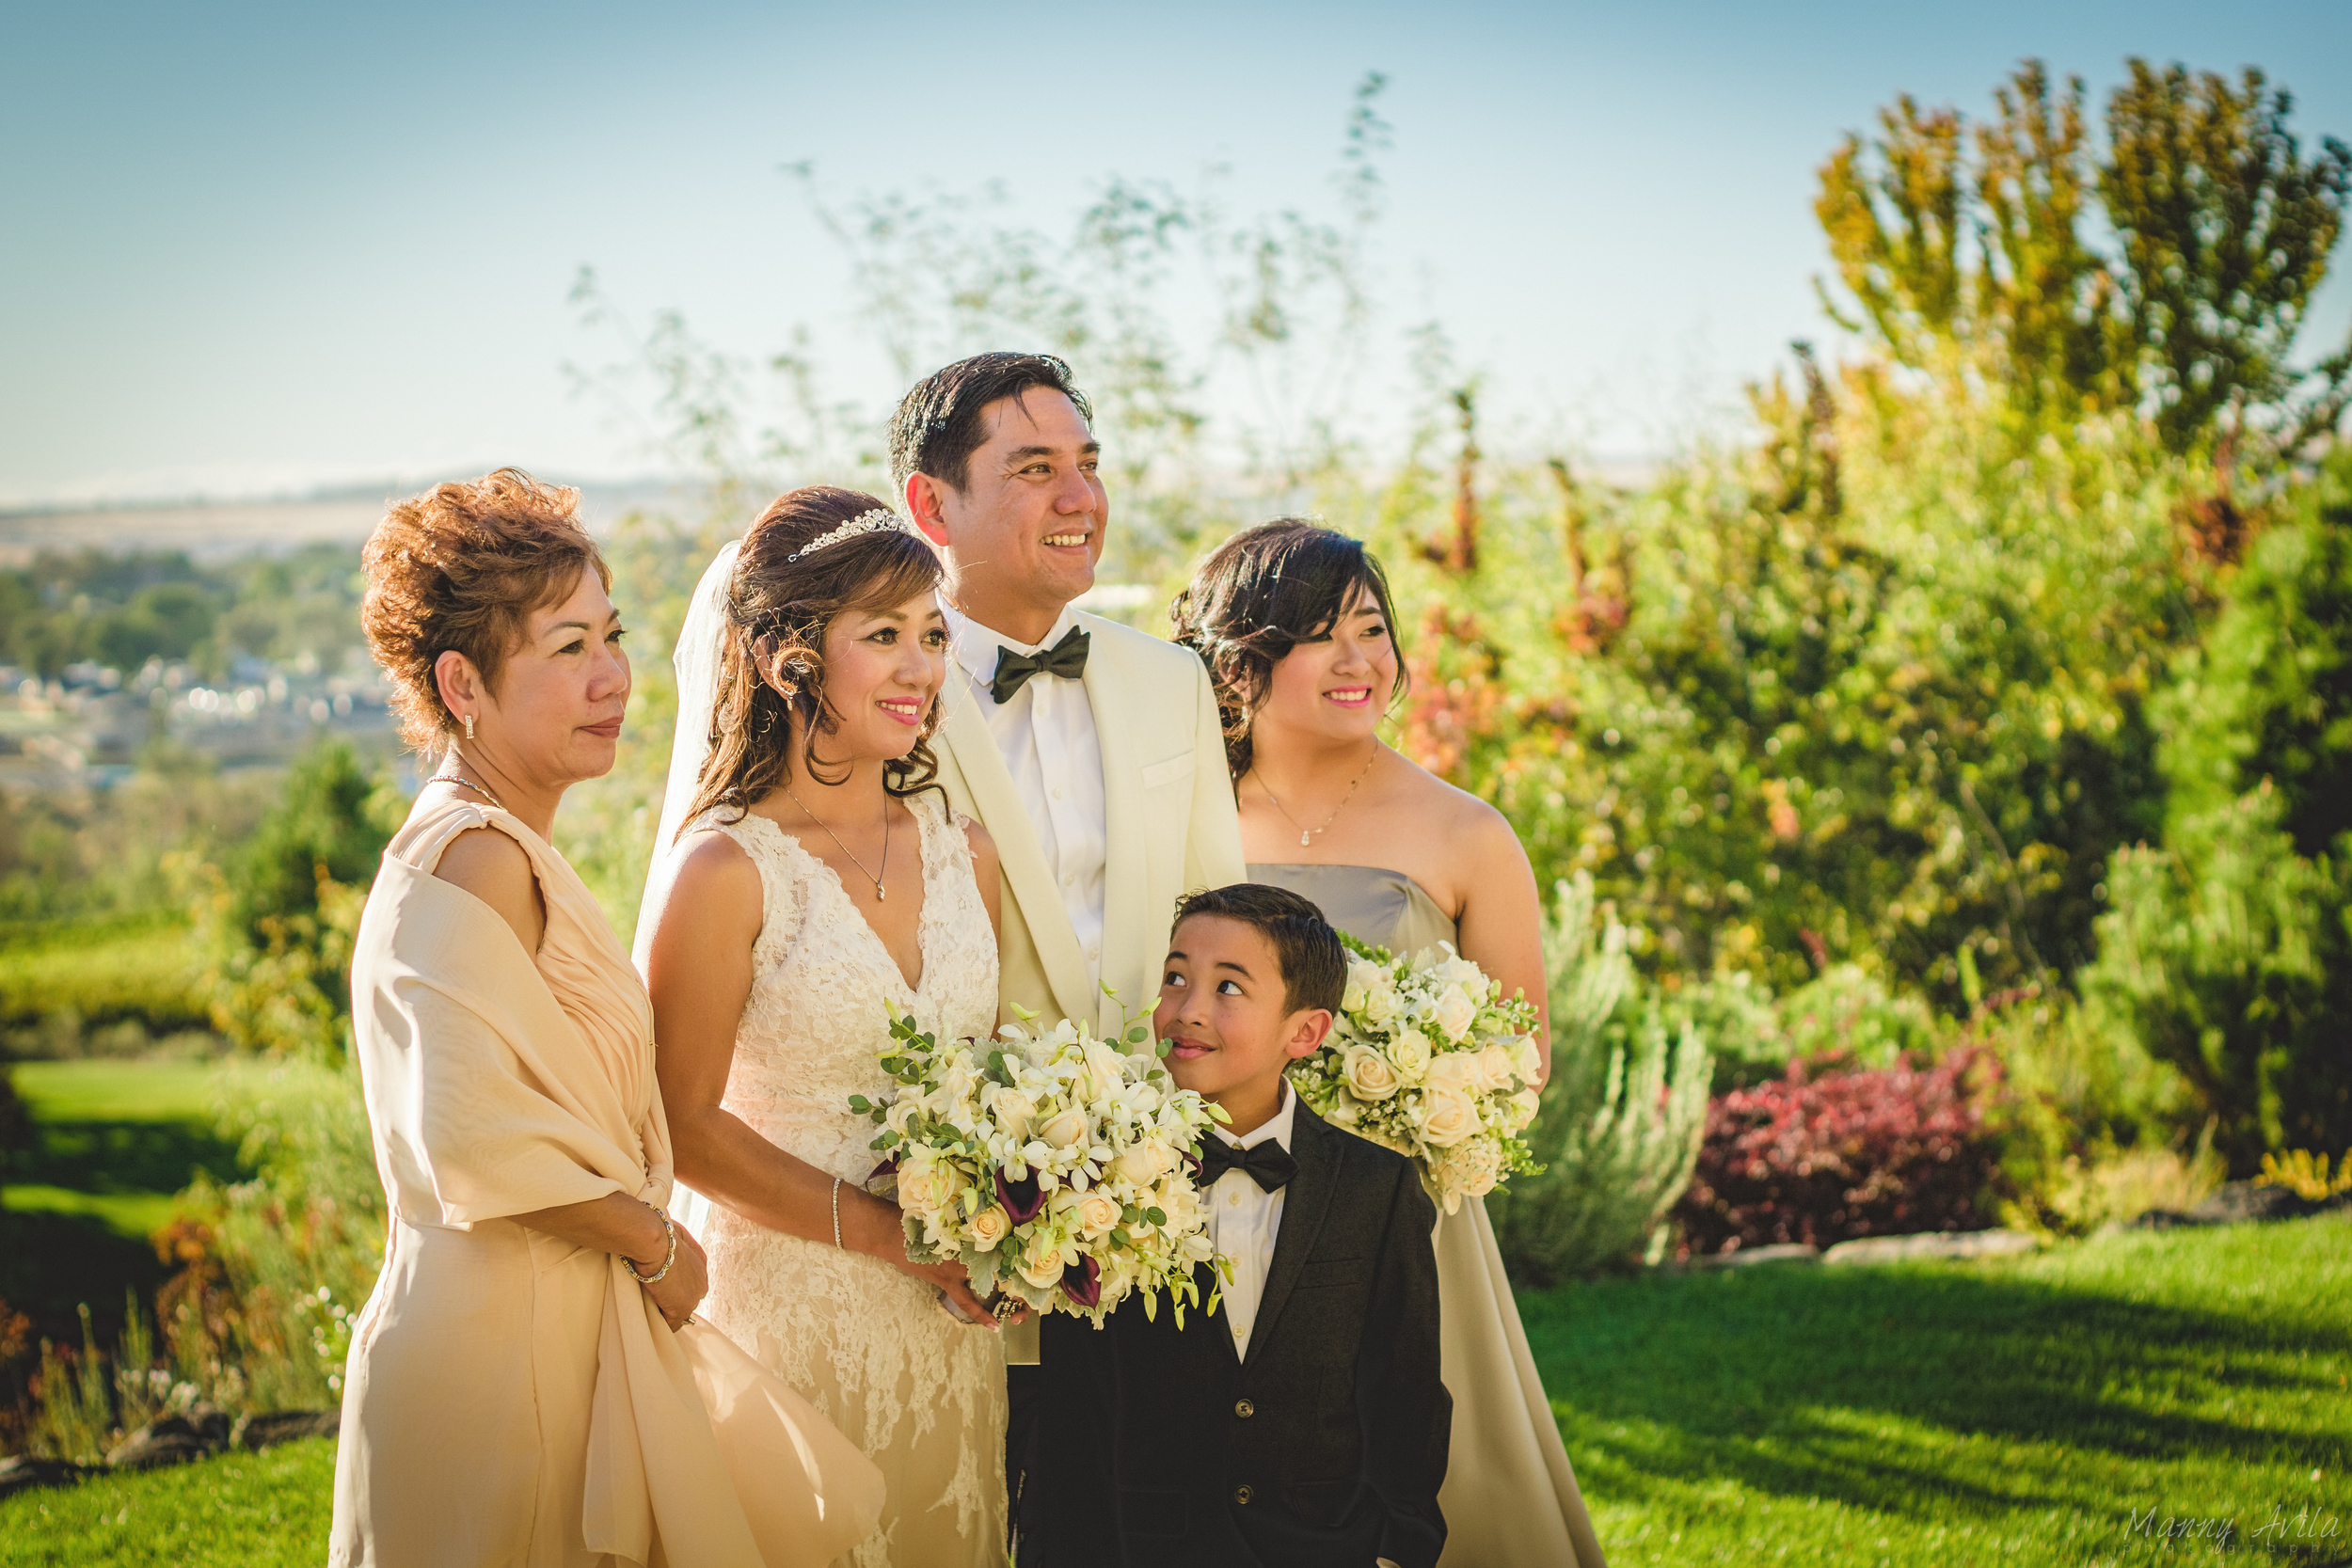 luke & love wedding (9-20-2015) -025-Edit-2.jpg